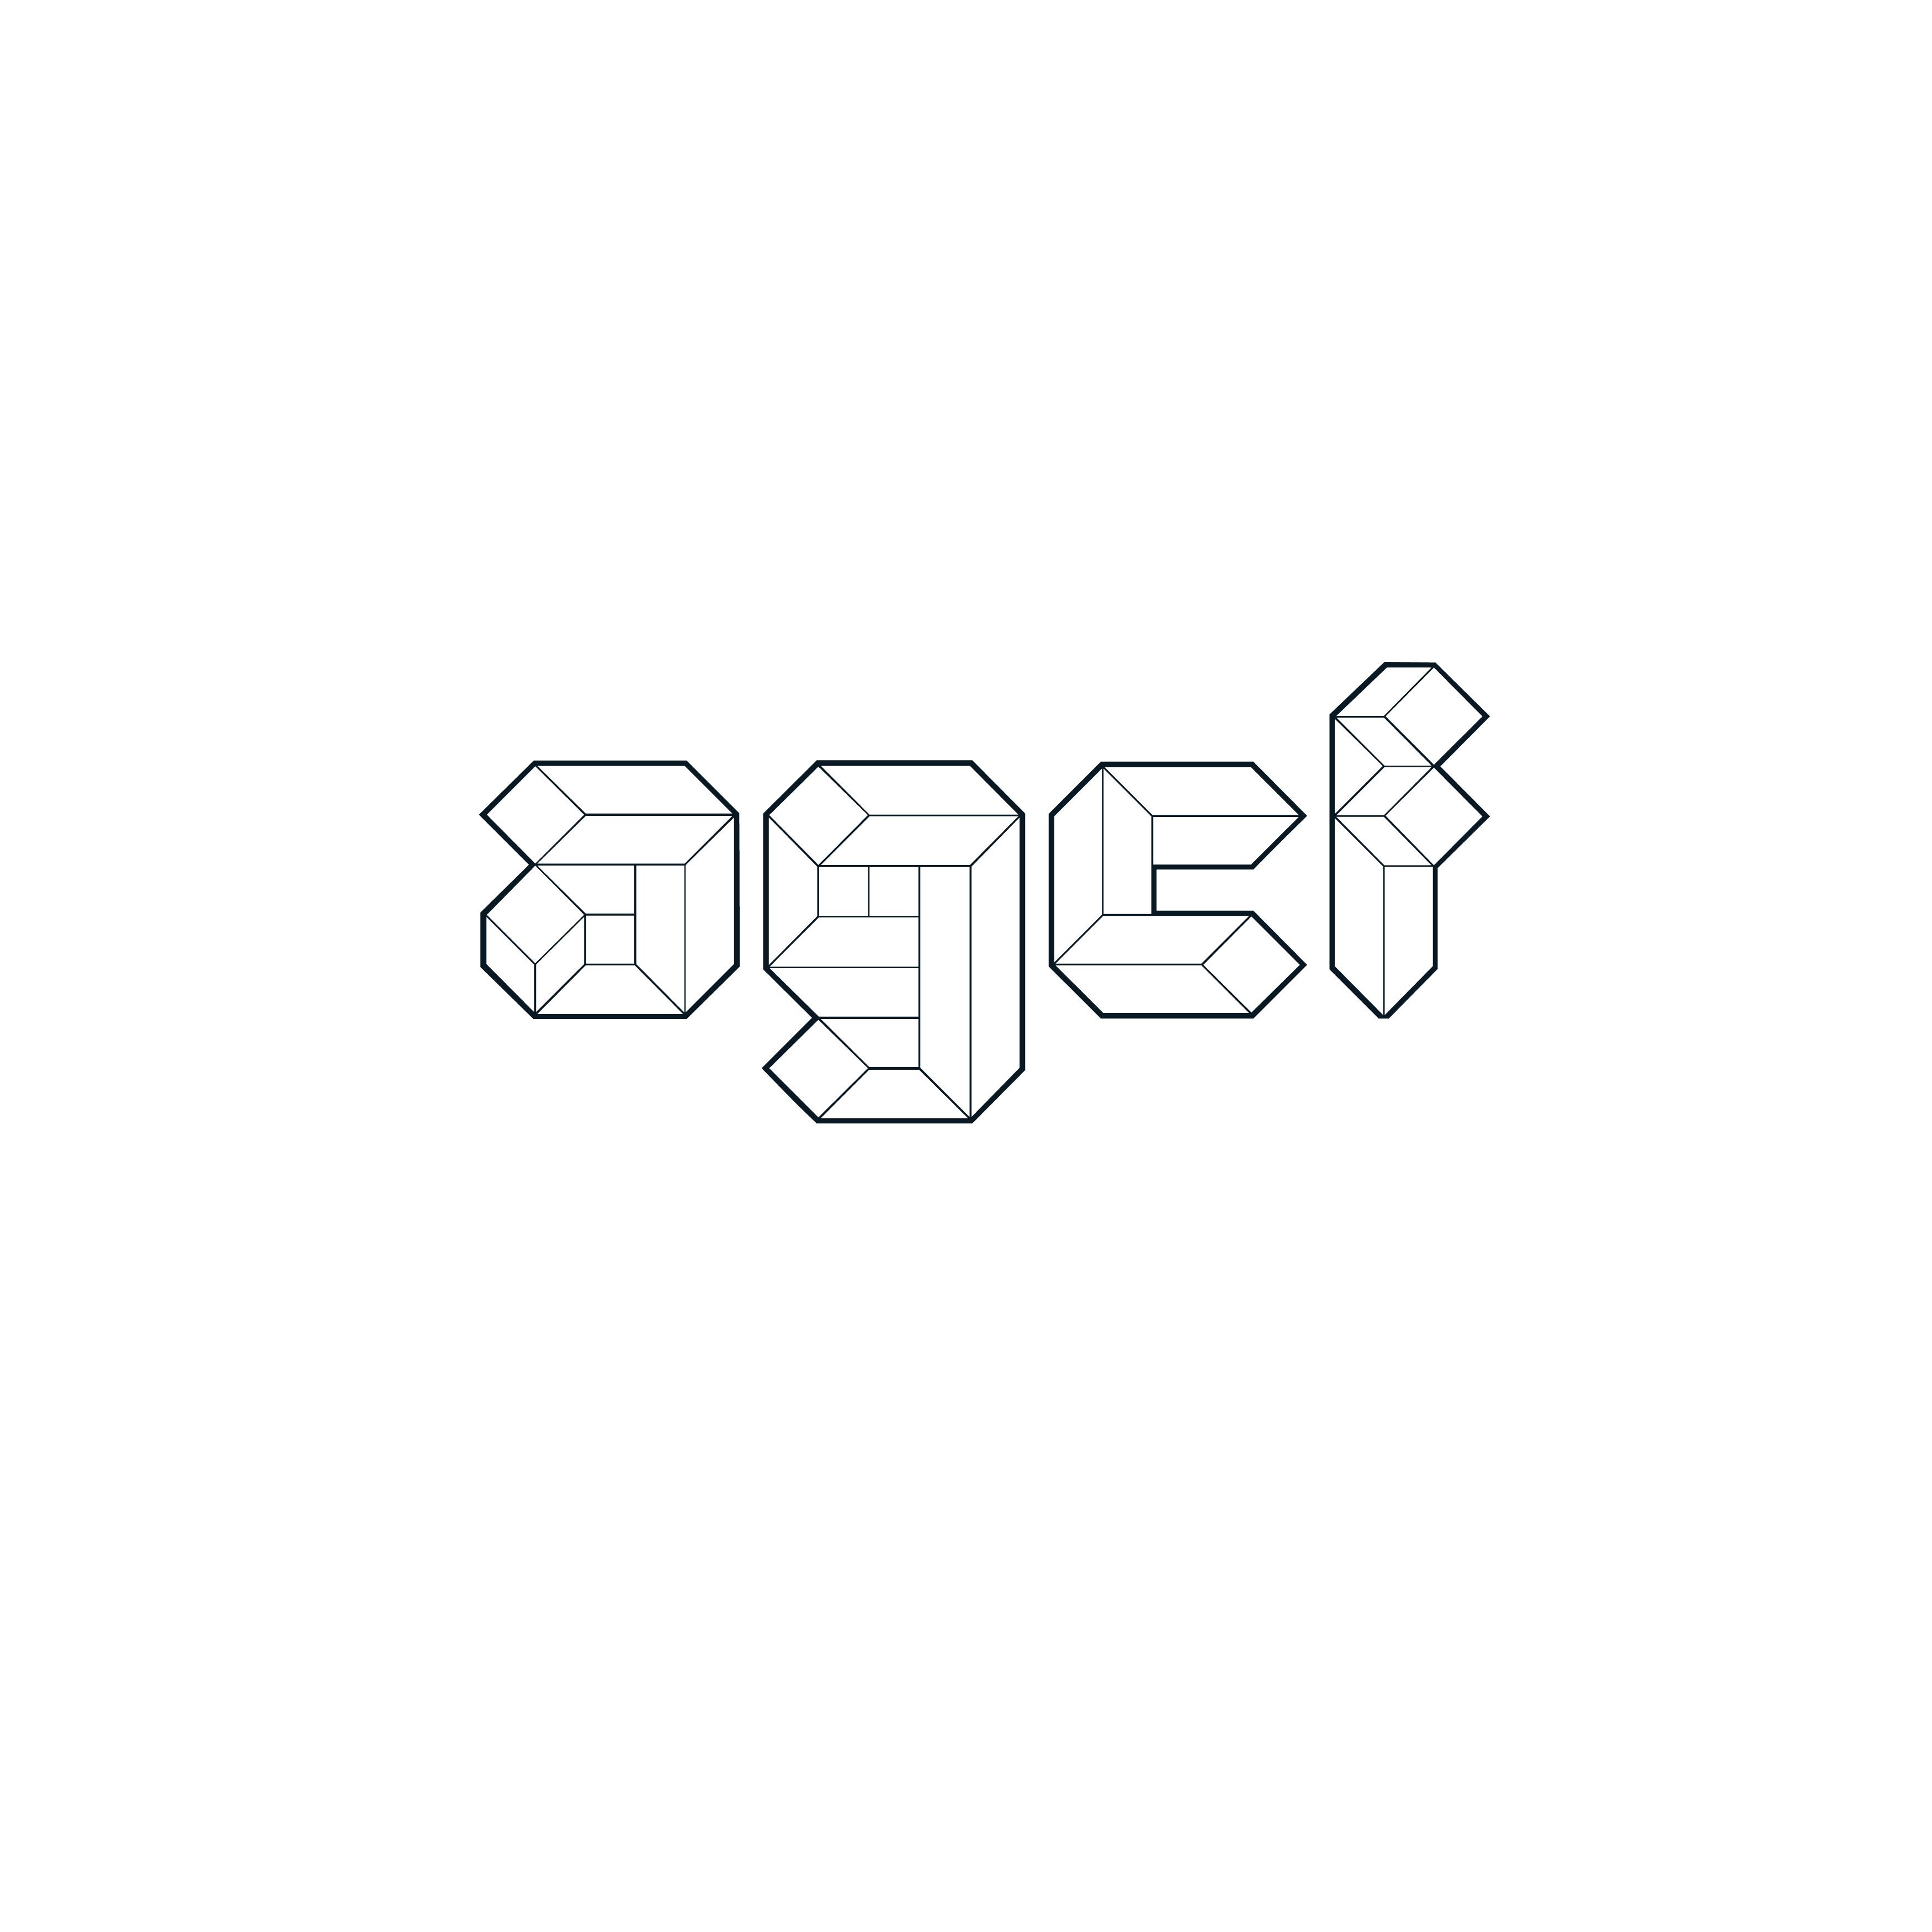 Logo Design by Utkarsh Bhandari - Entry No. 190 in the Logo Design Contest Imaginative Logo Design for AGCF.